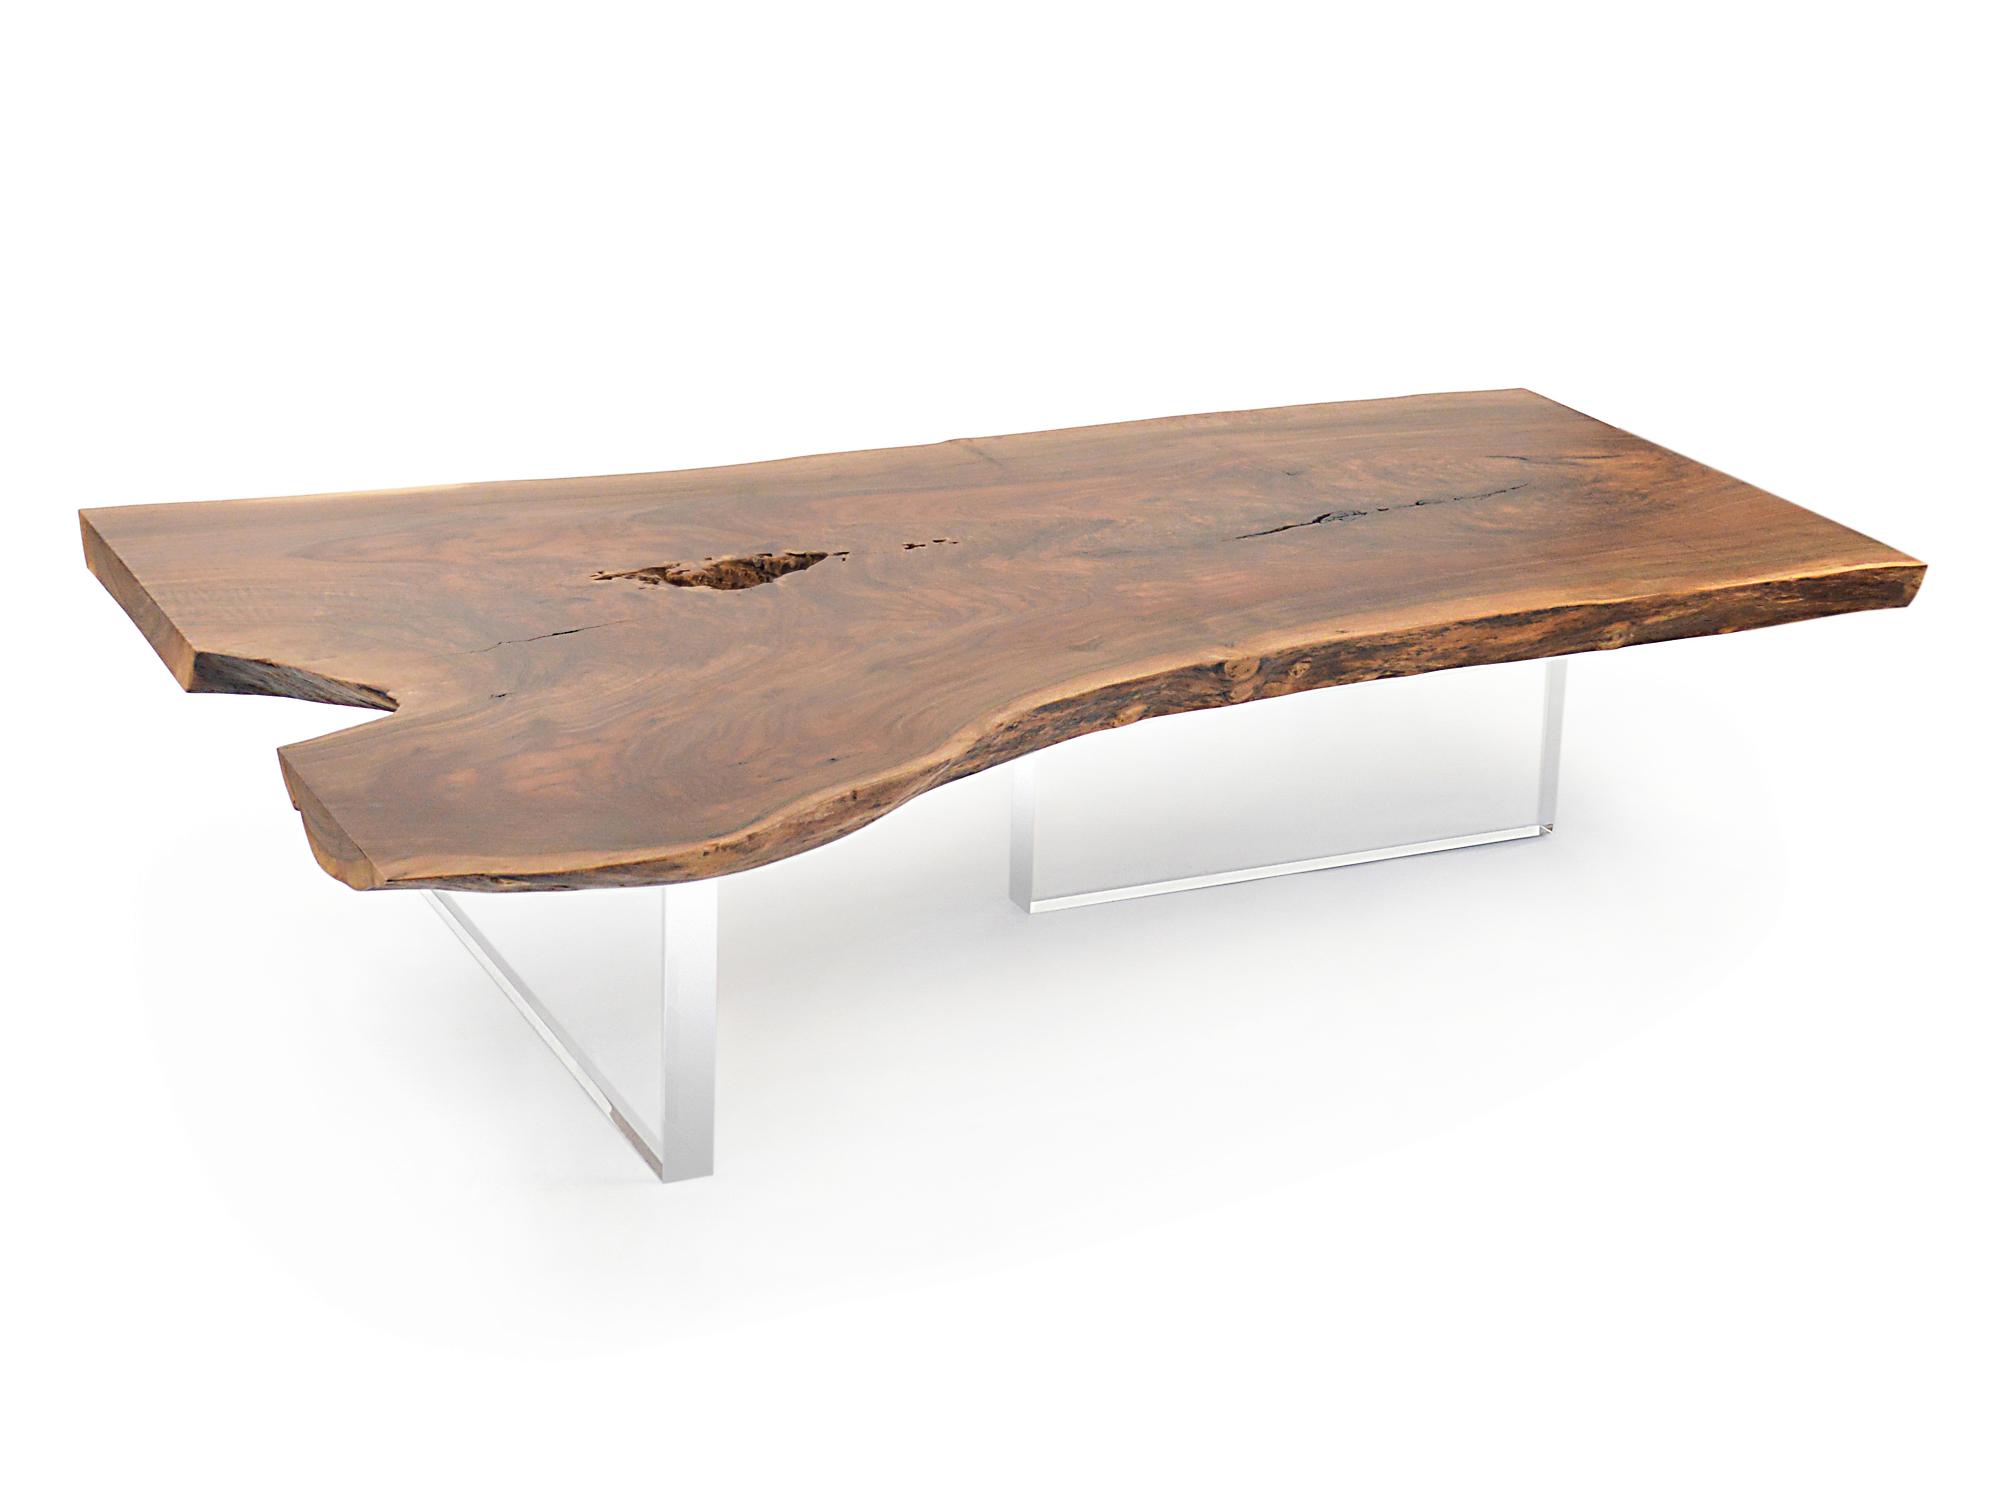 Live Edge Claro Walnut Coffee Table - Acrylic Base 002 - 05